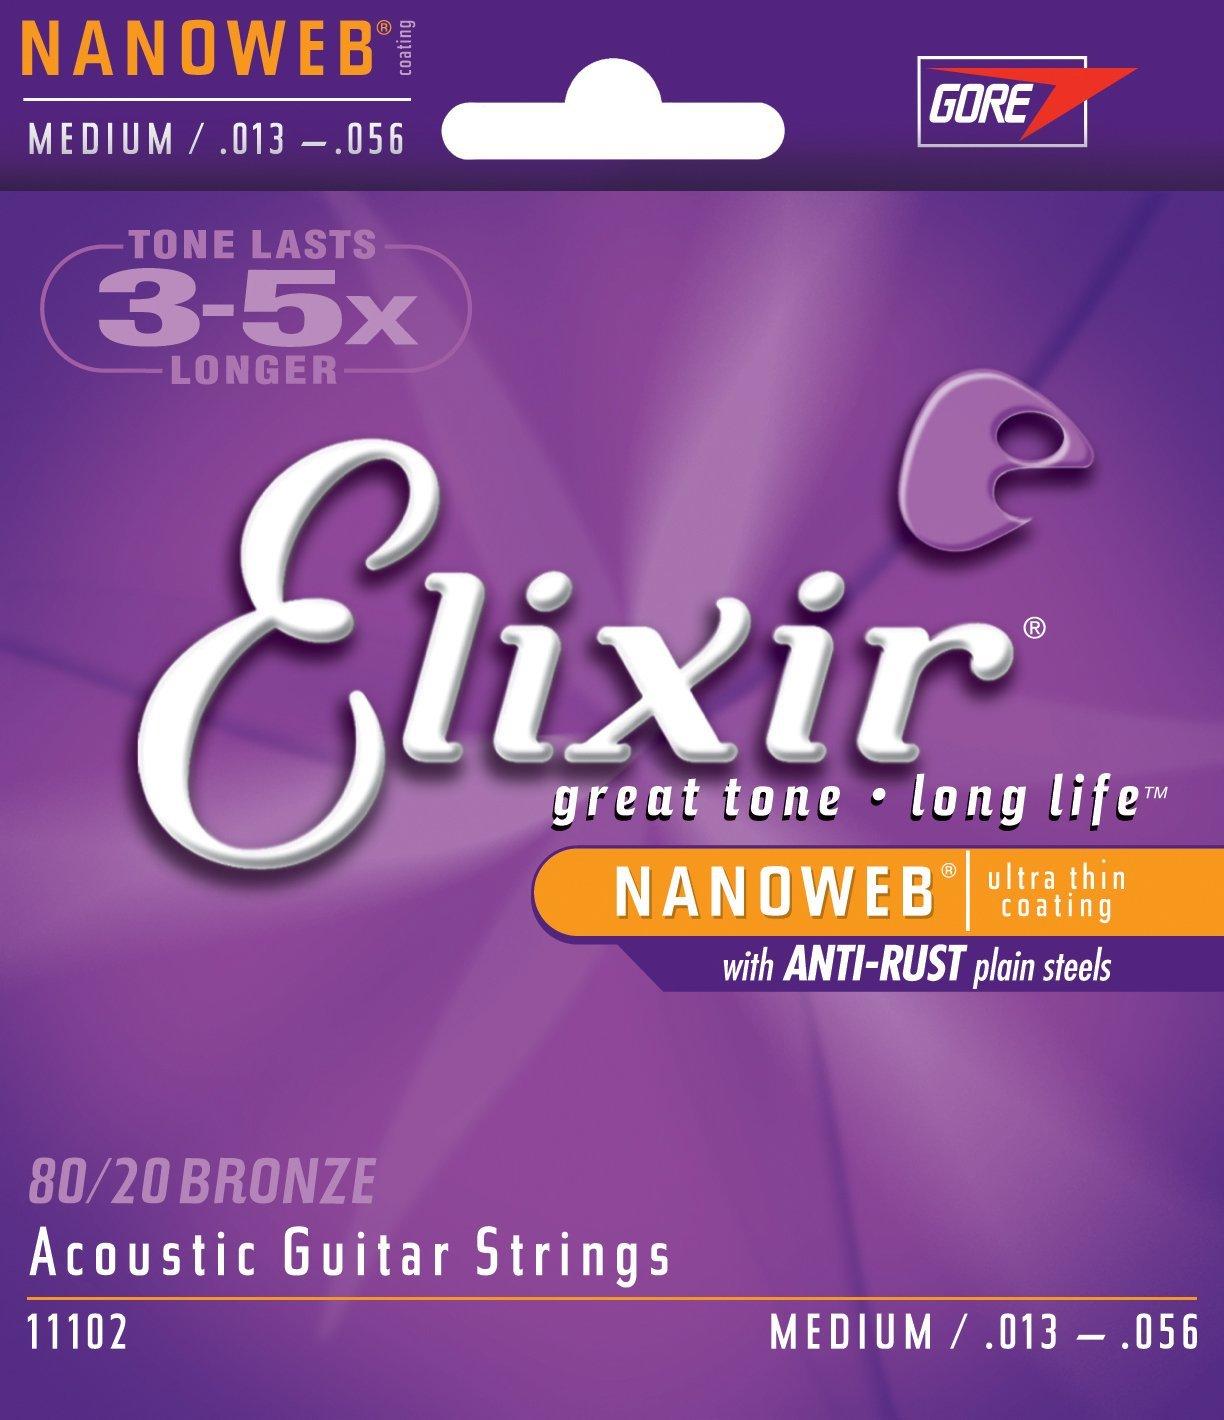 Elixir 11102 80/20 Bronze Acoustic Guitar Strings with NANOWEB Coating, Medium (.013-.056)